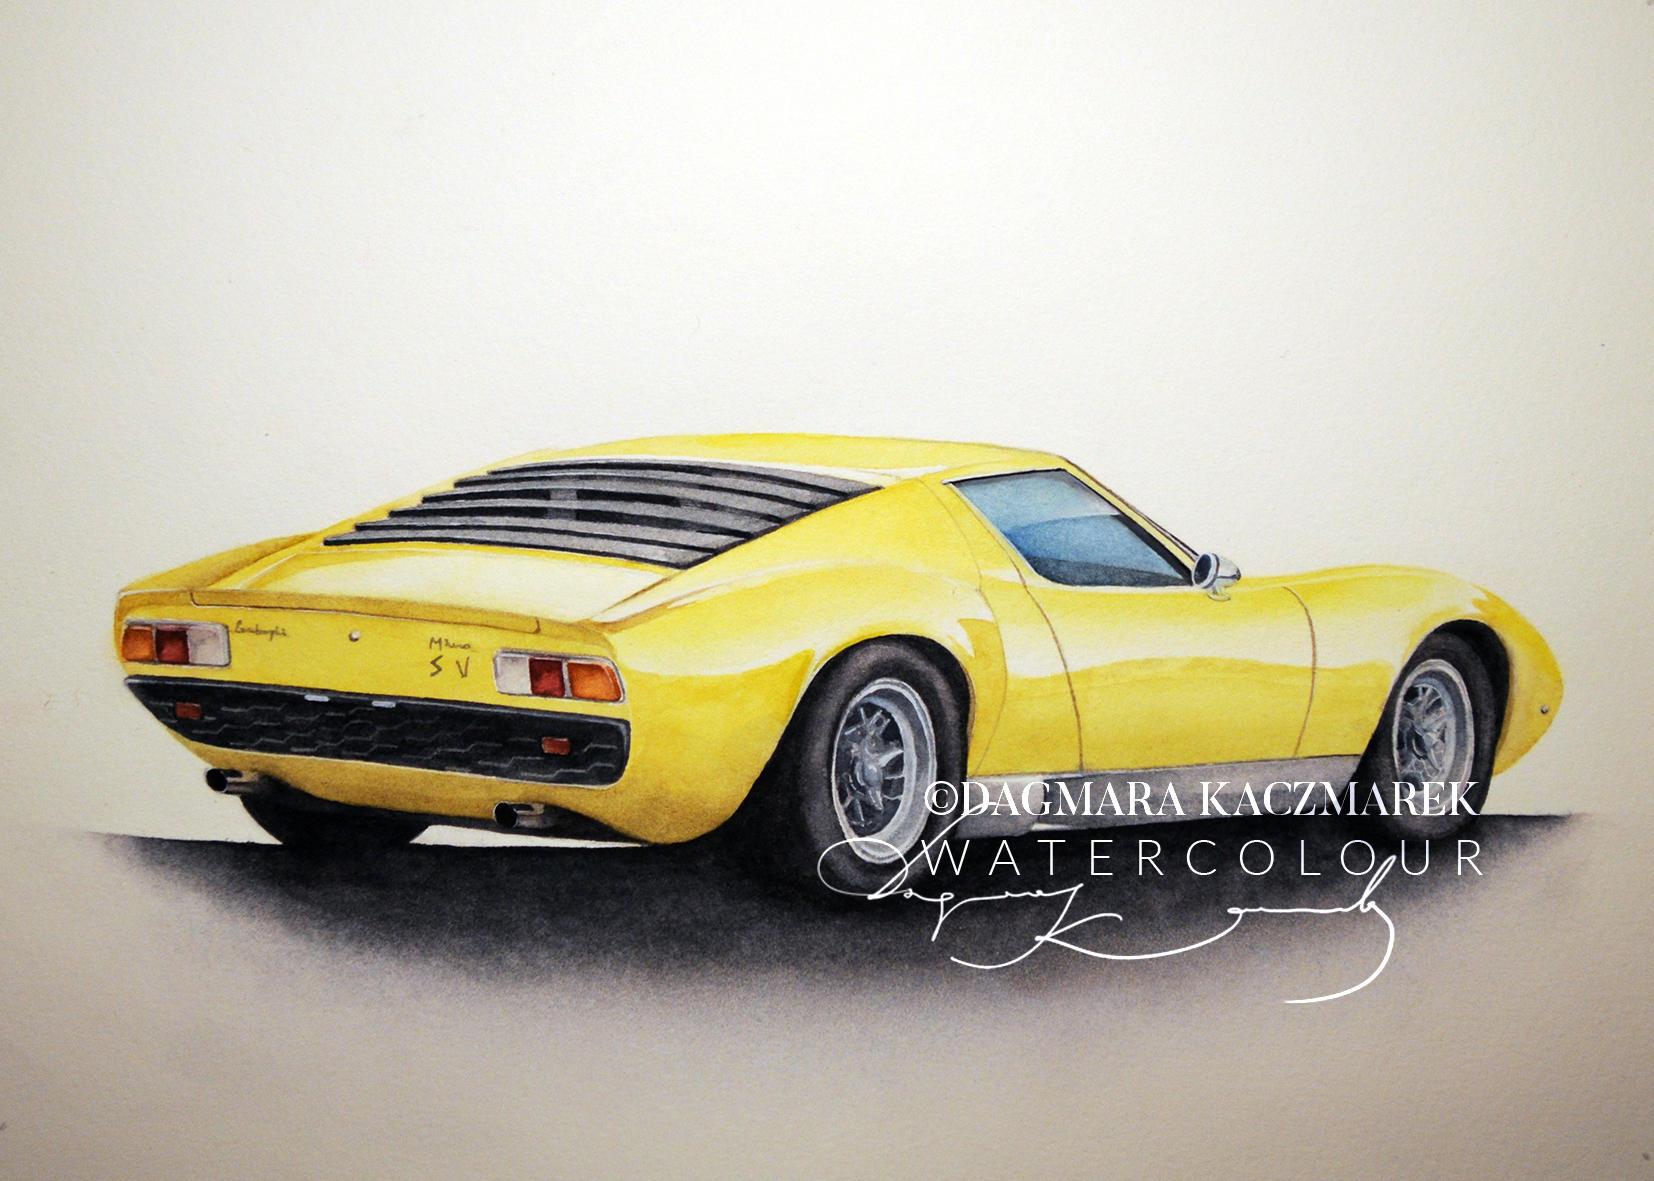 Lamborghini Miura original old car watercolour painting on